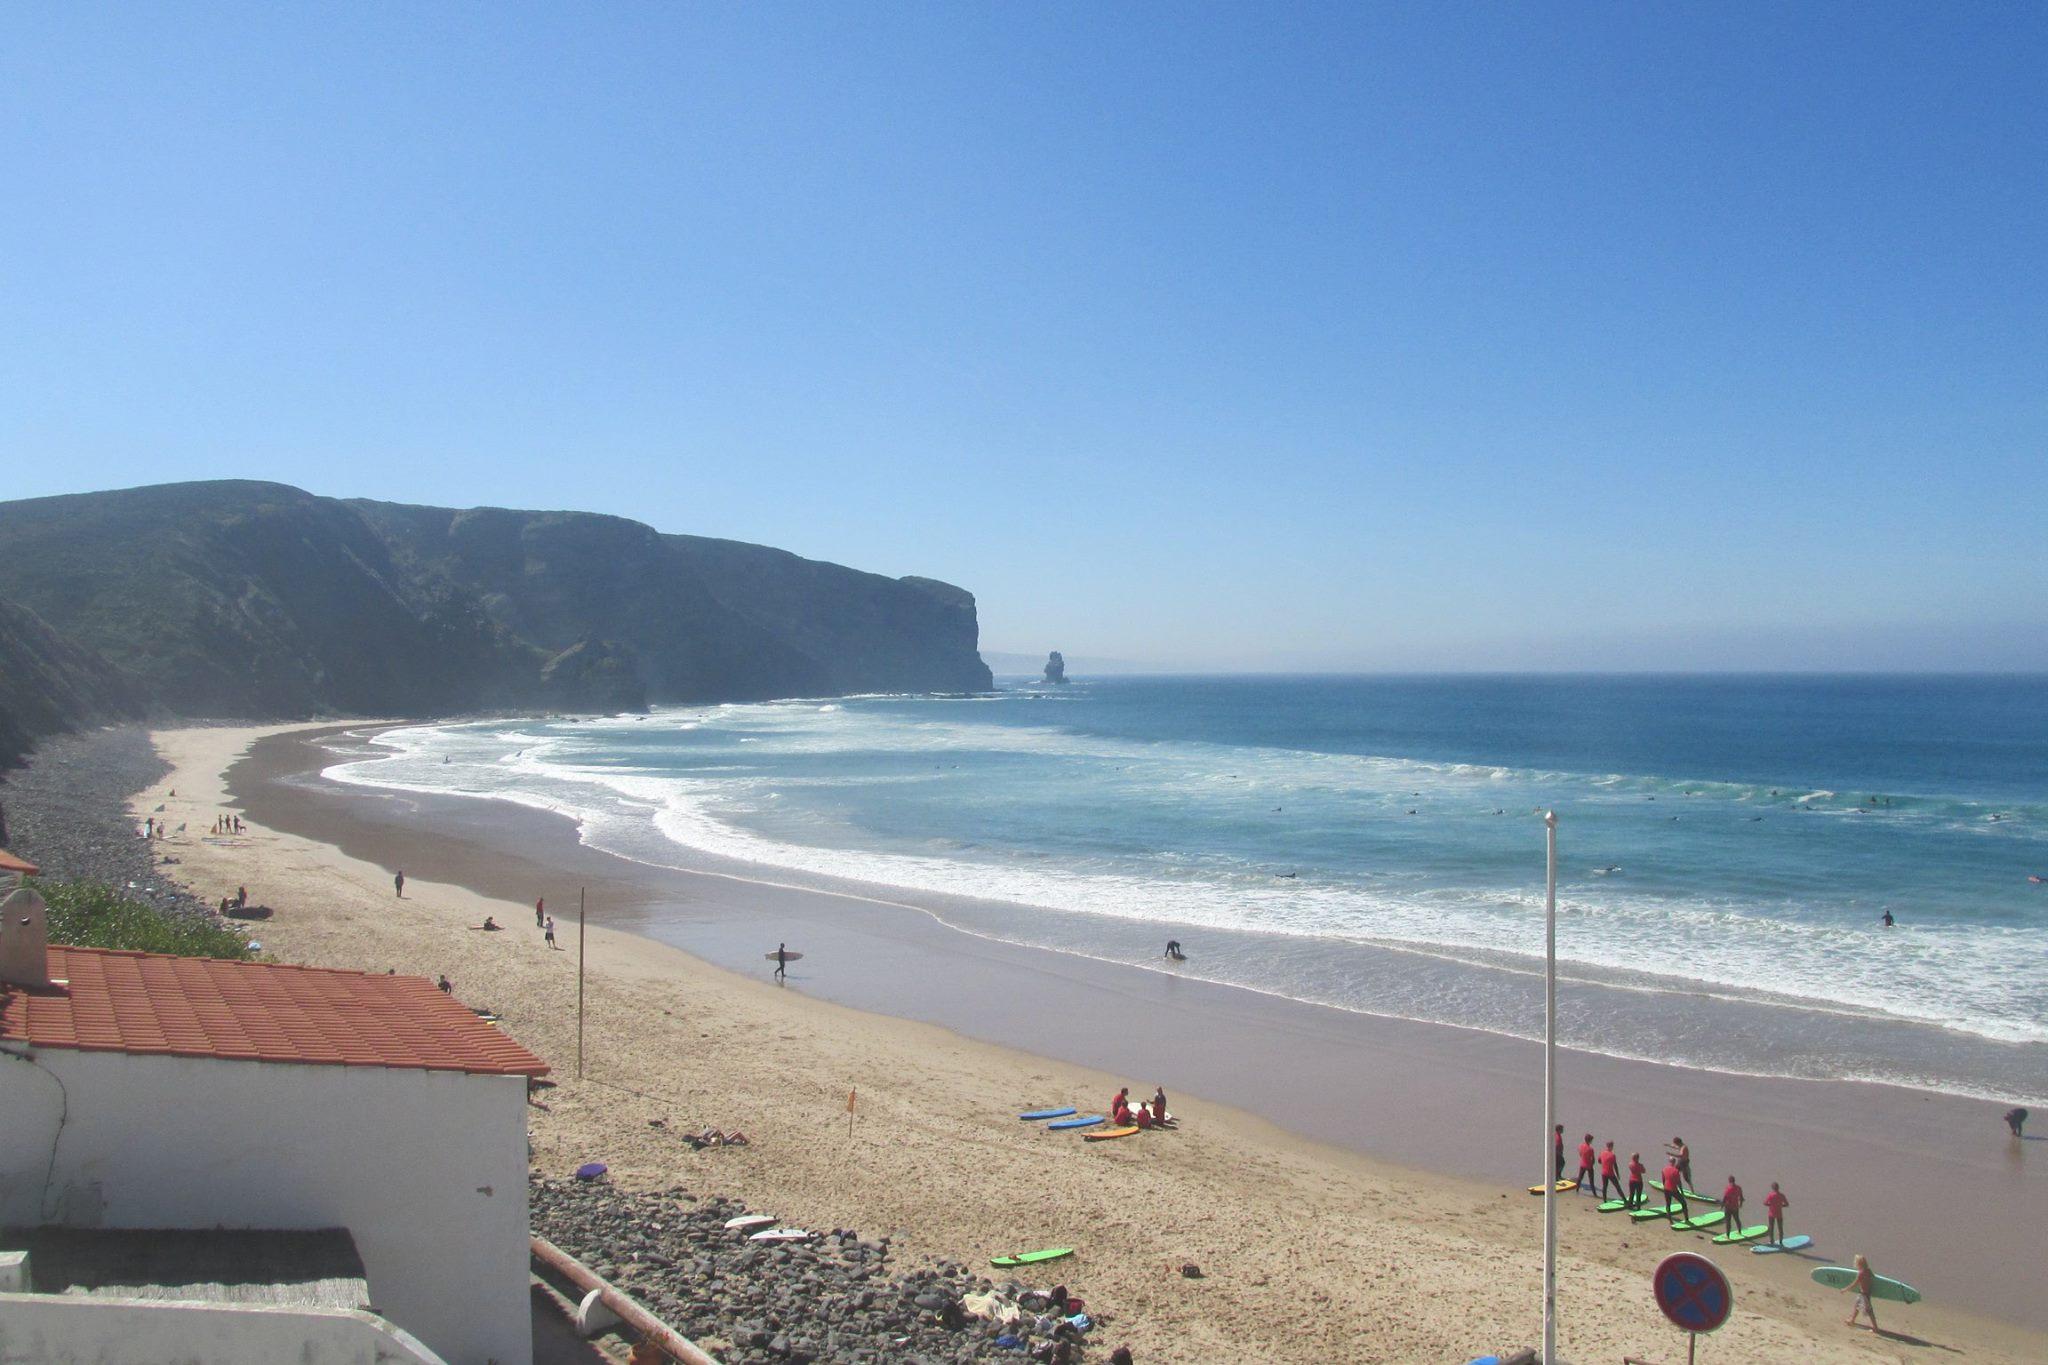 Holiday apartments and villas for rent, Cosy Villa near the best beaches on the Algarve West Coast in Urbanização Vale da Telha Aljezur, Portugal Algarve, REF_IMG_8514_8519